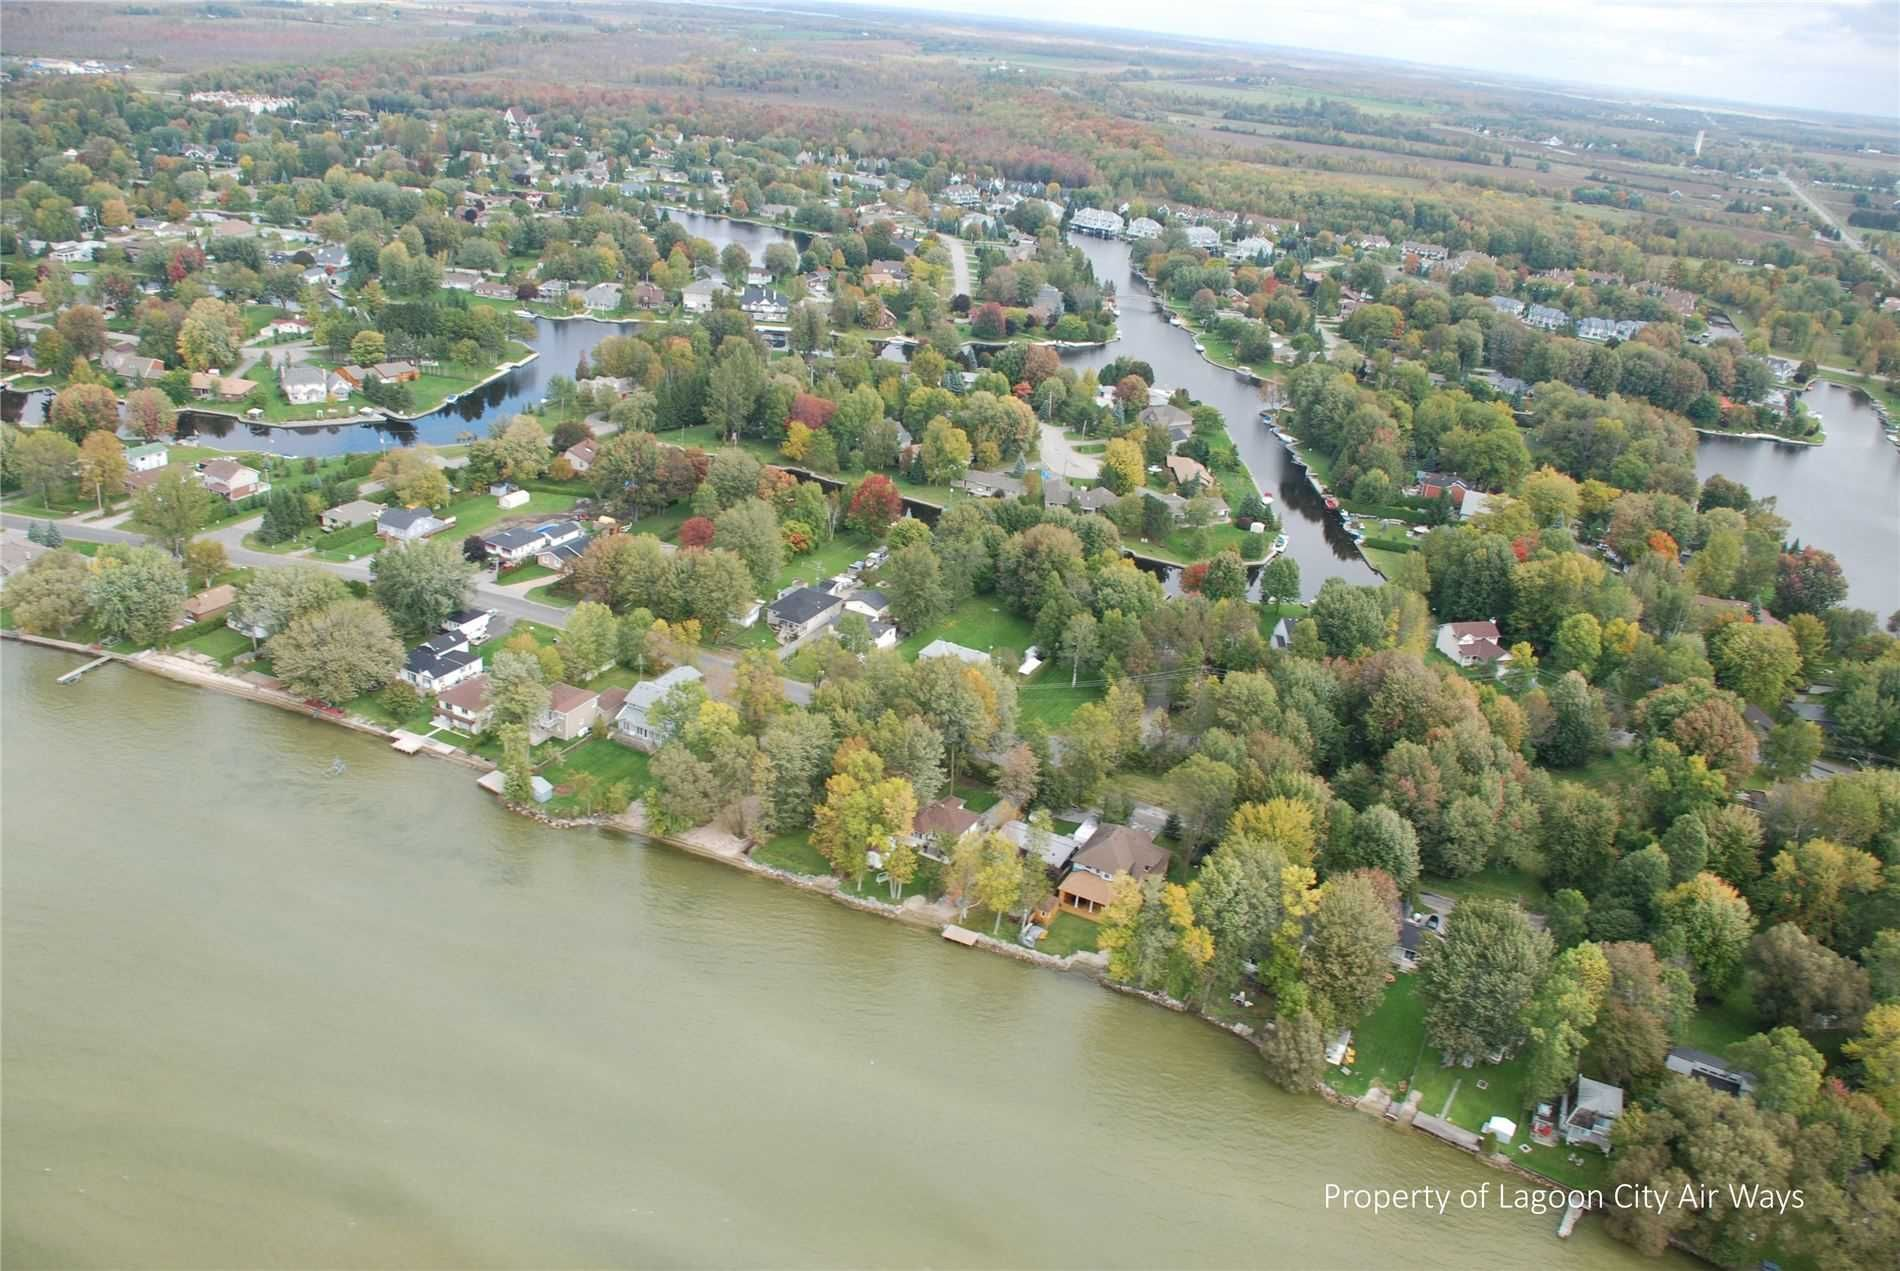 Main Photo: 13 Lake Avenue in Ramara: Brechin Property for sale : MLS®# S5142309